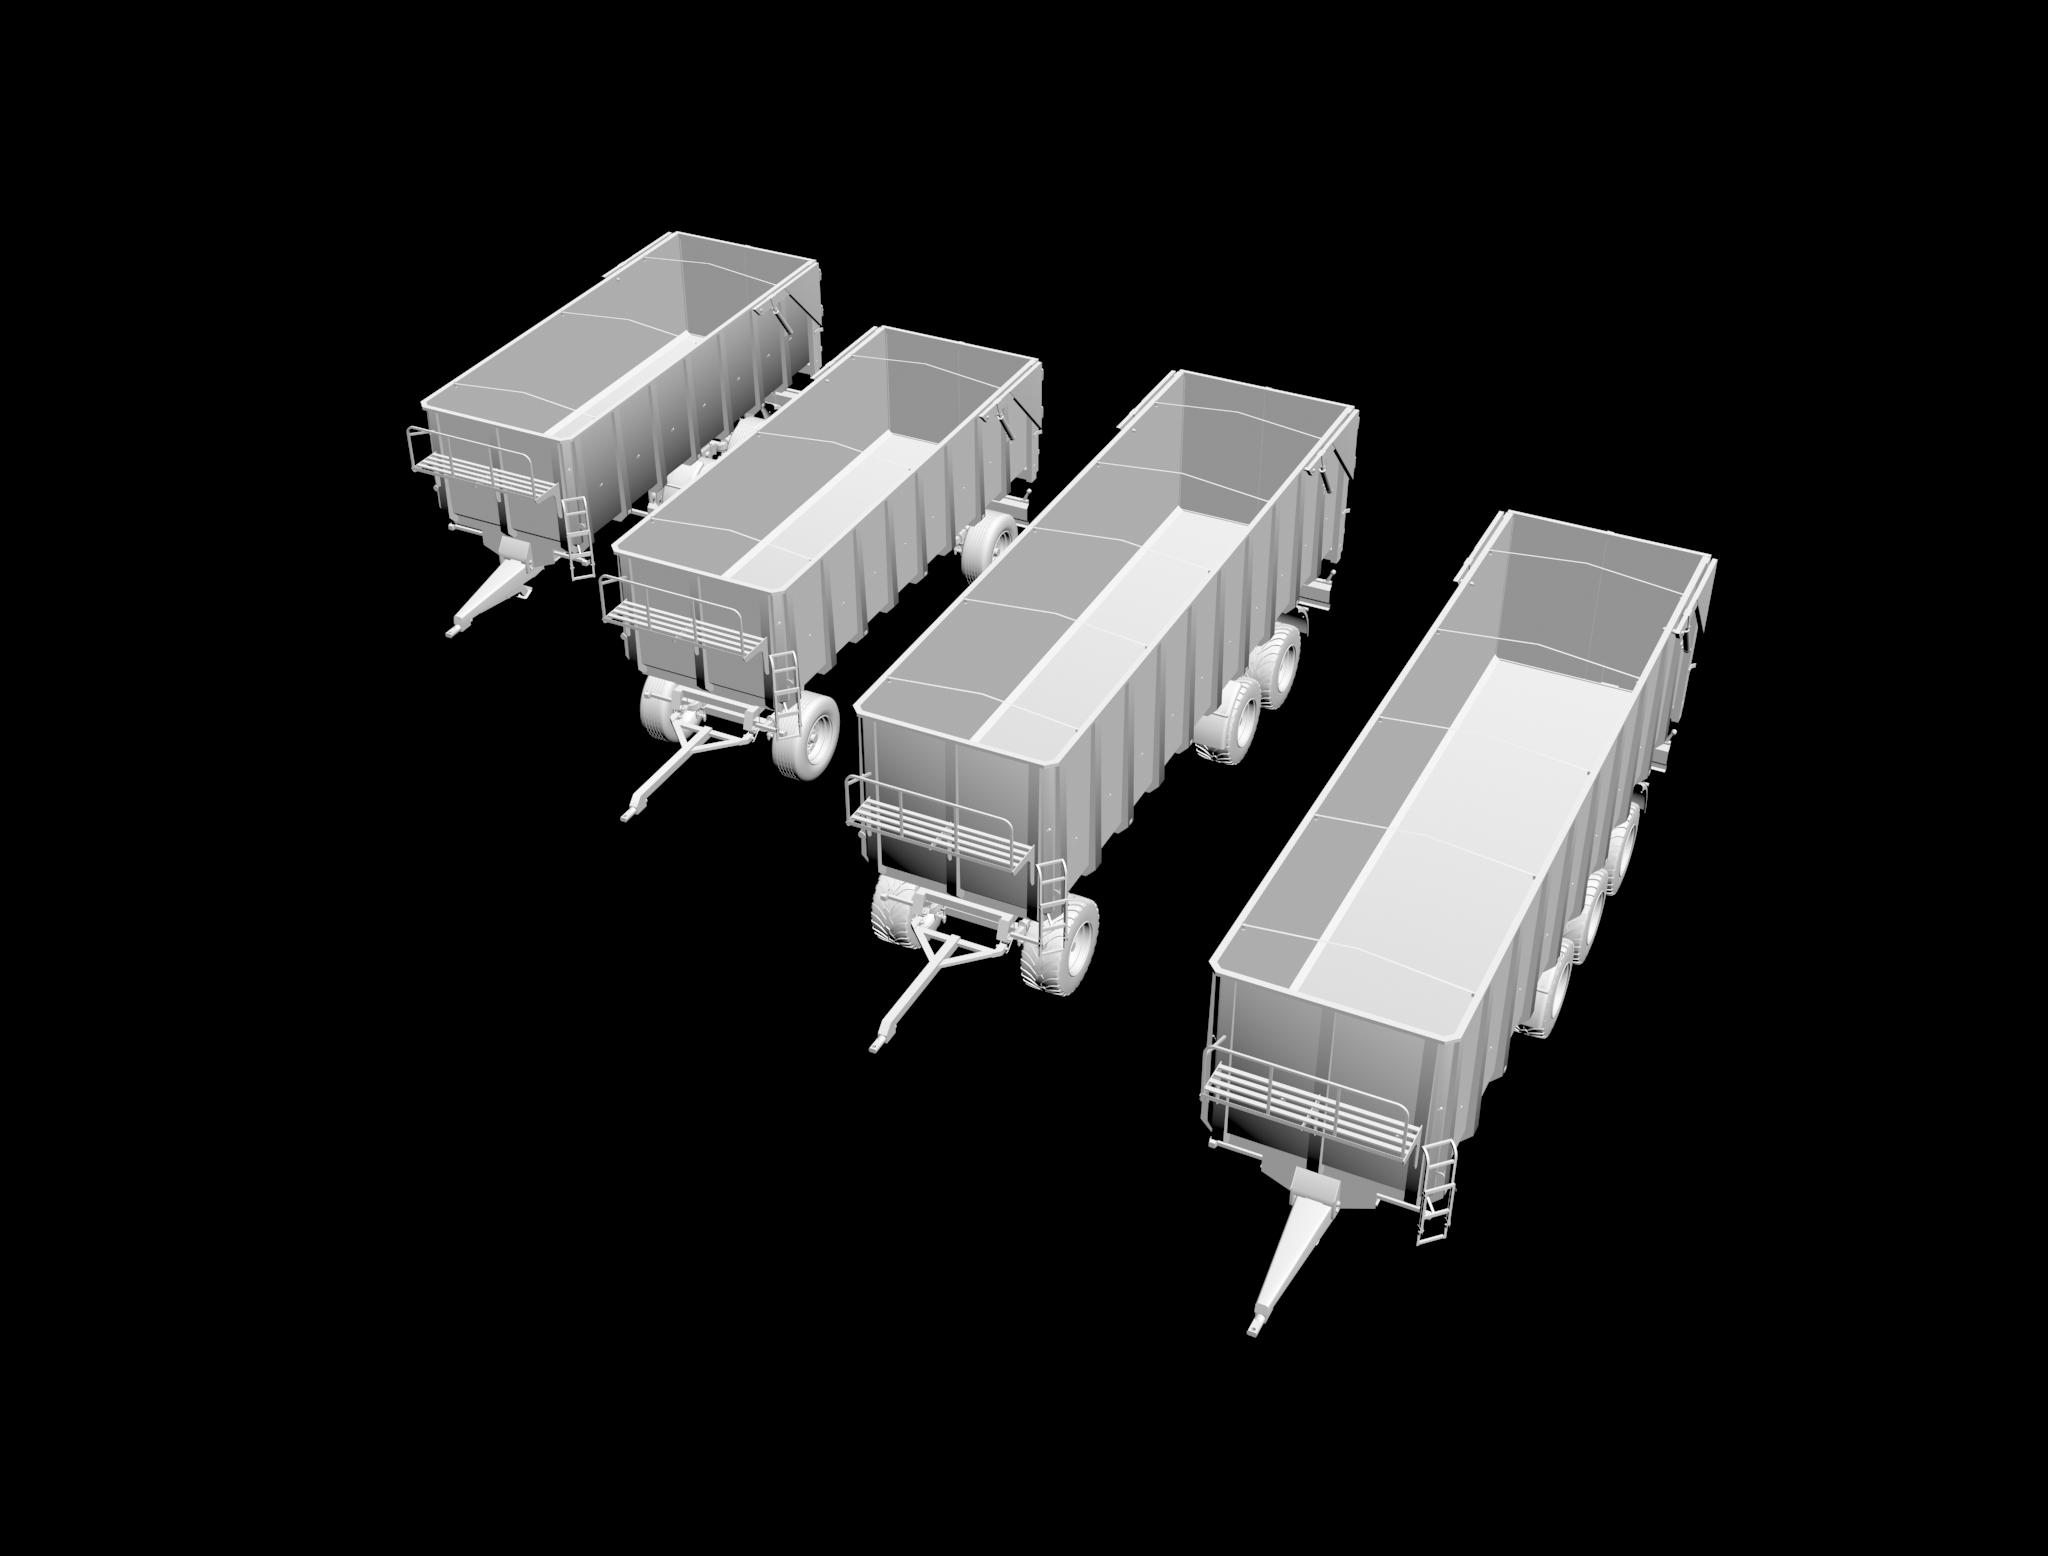 [Encuesta][T.E.P.] Proyecto Aguas Tenias (22 modelos + 1 Camión) [Terminado 21-4-2014]. - Página 2 300rzsn